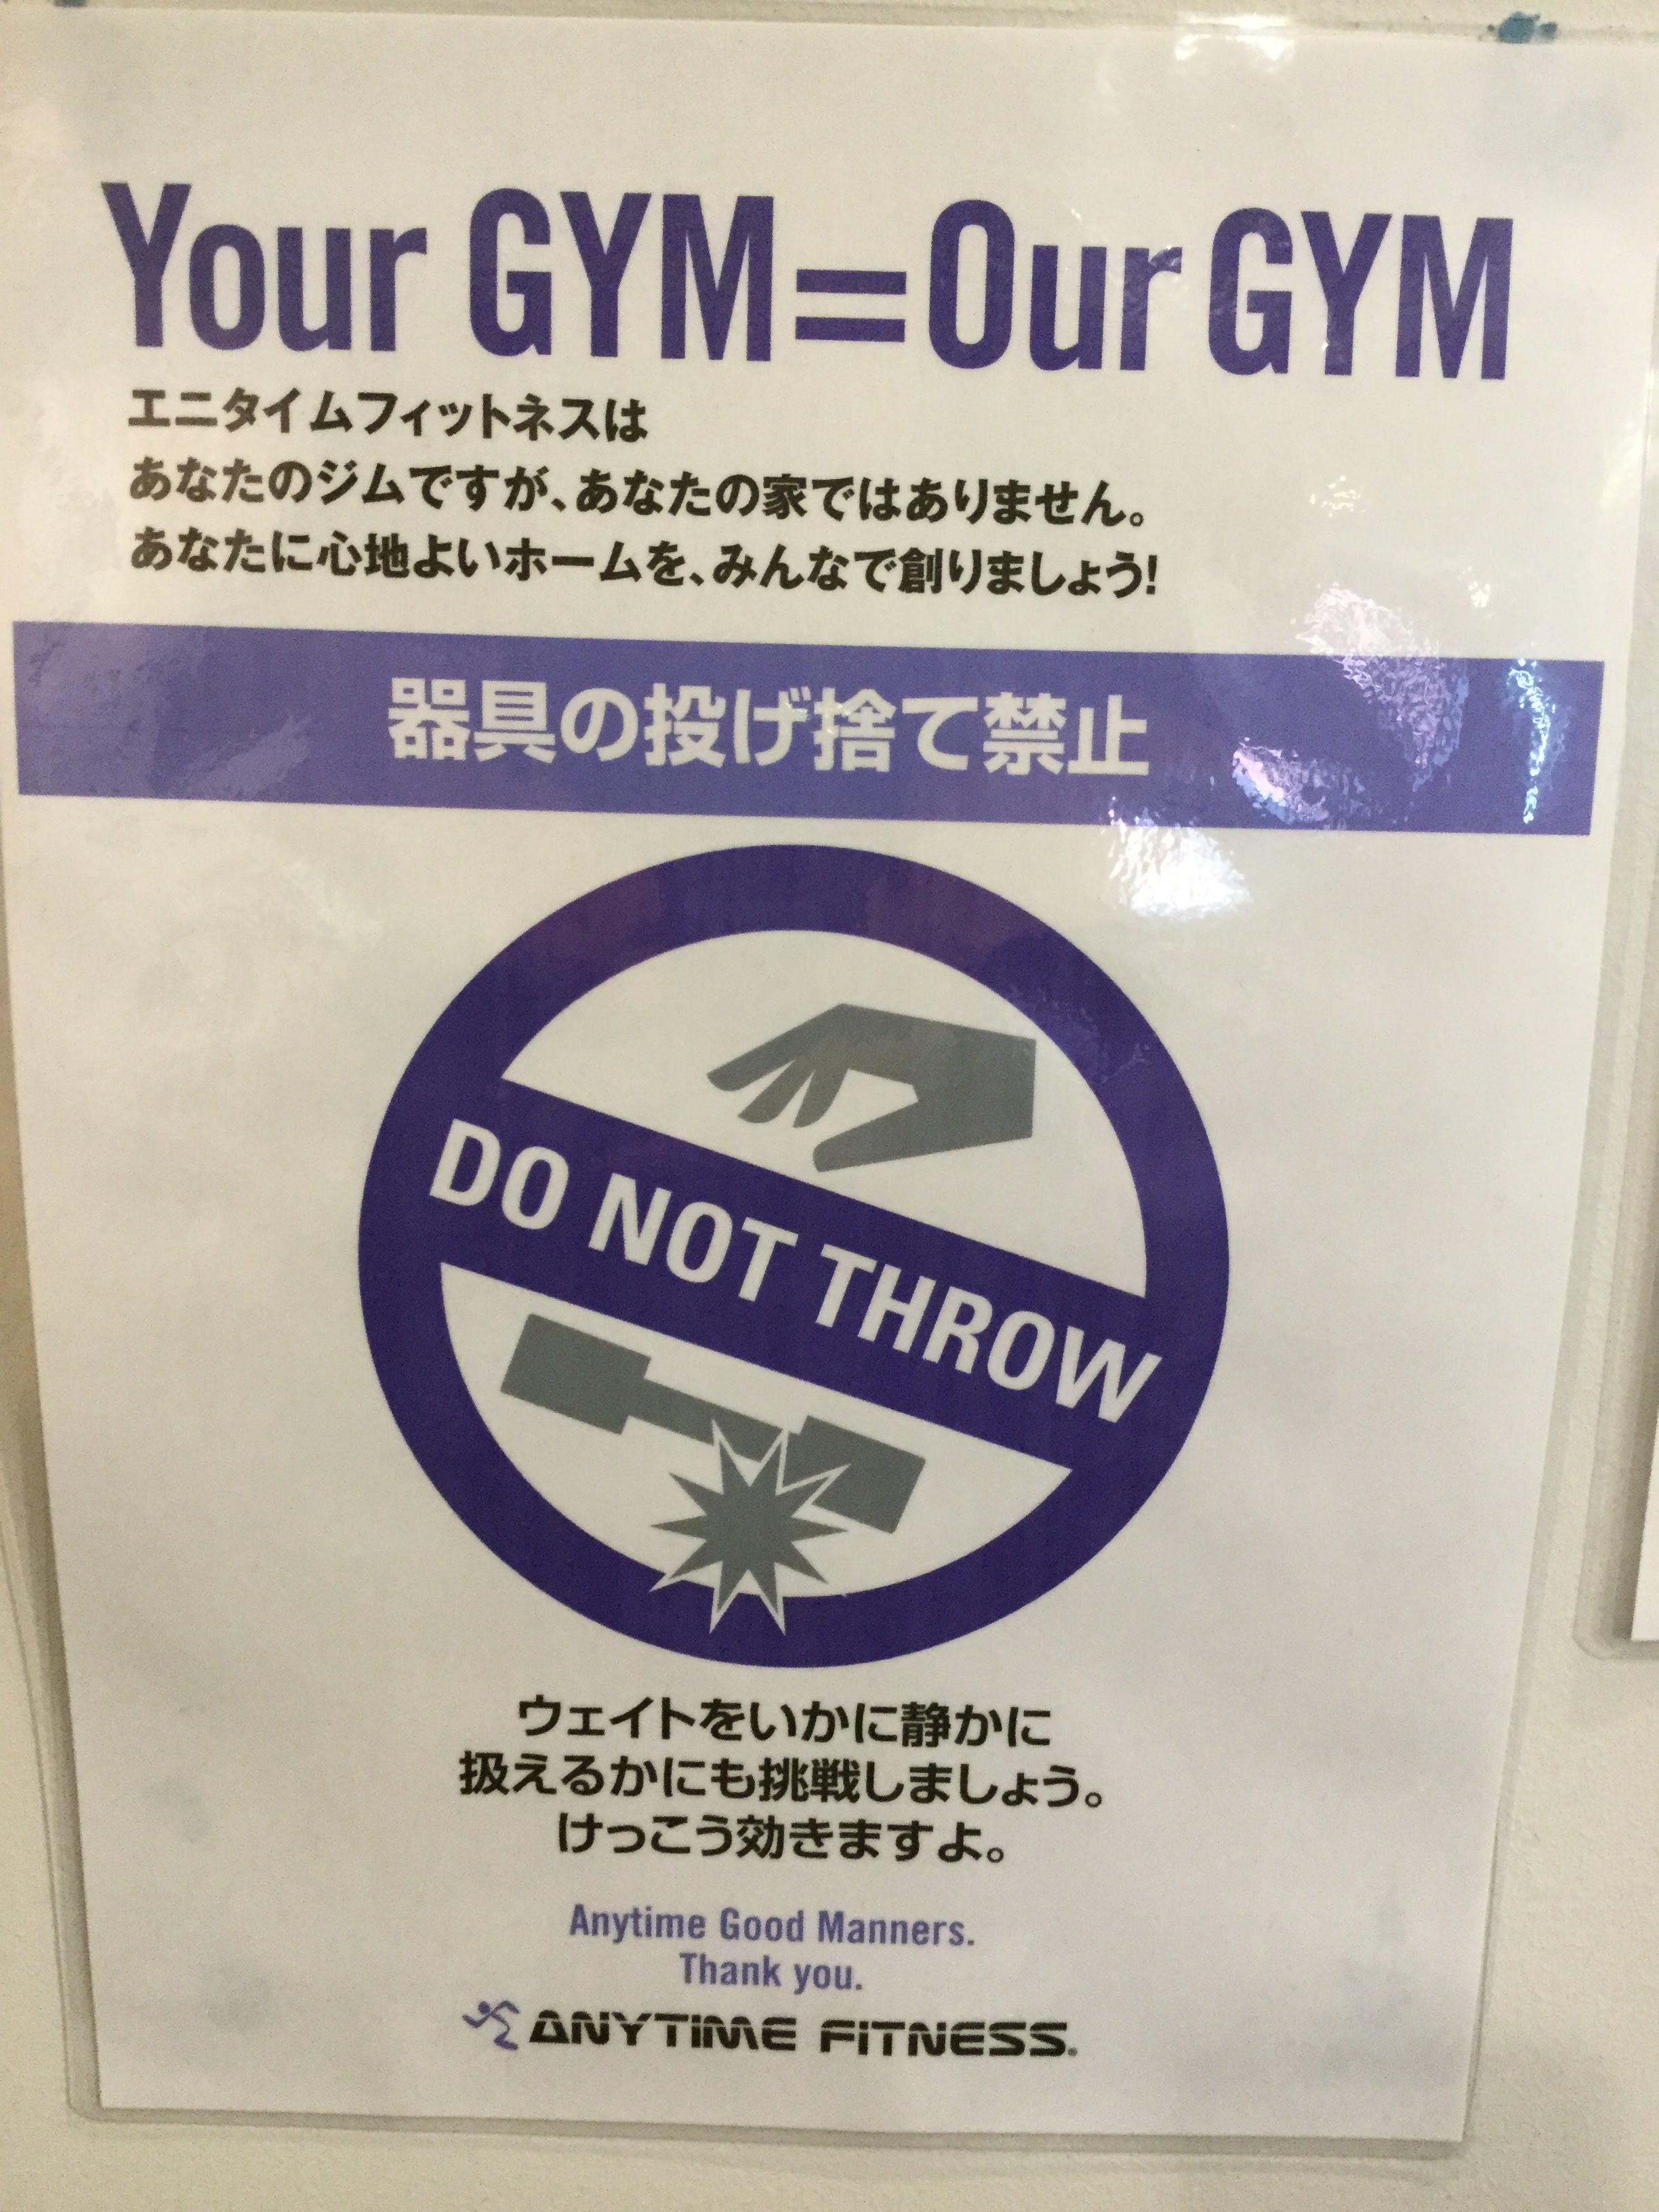 DO NOT THROW 器具の投げ捨て禁止